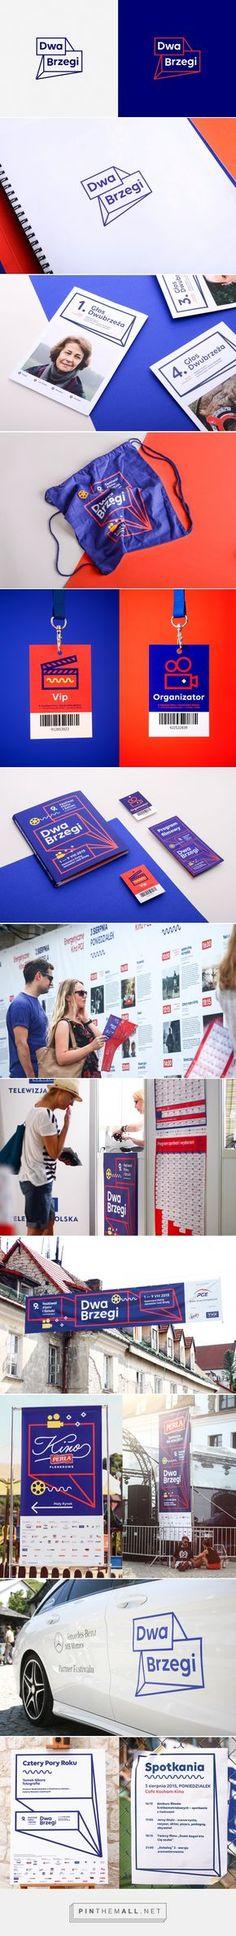 Dwa Brzegi - 9th Film and Art Festival on Behance - created via http://pinthemall.net